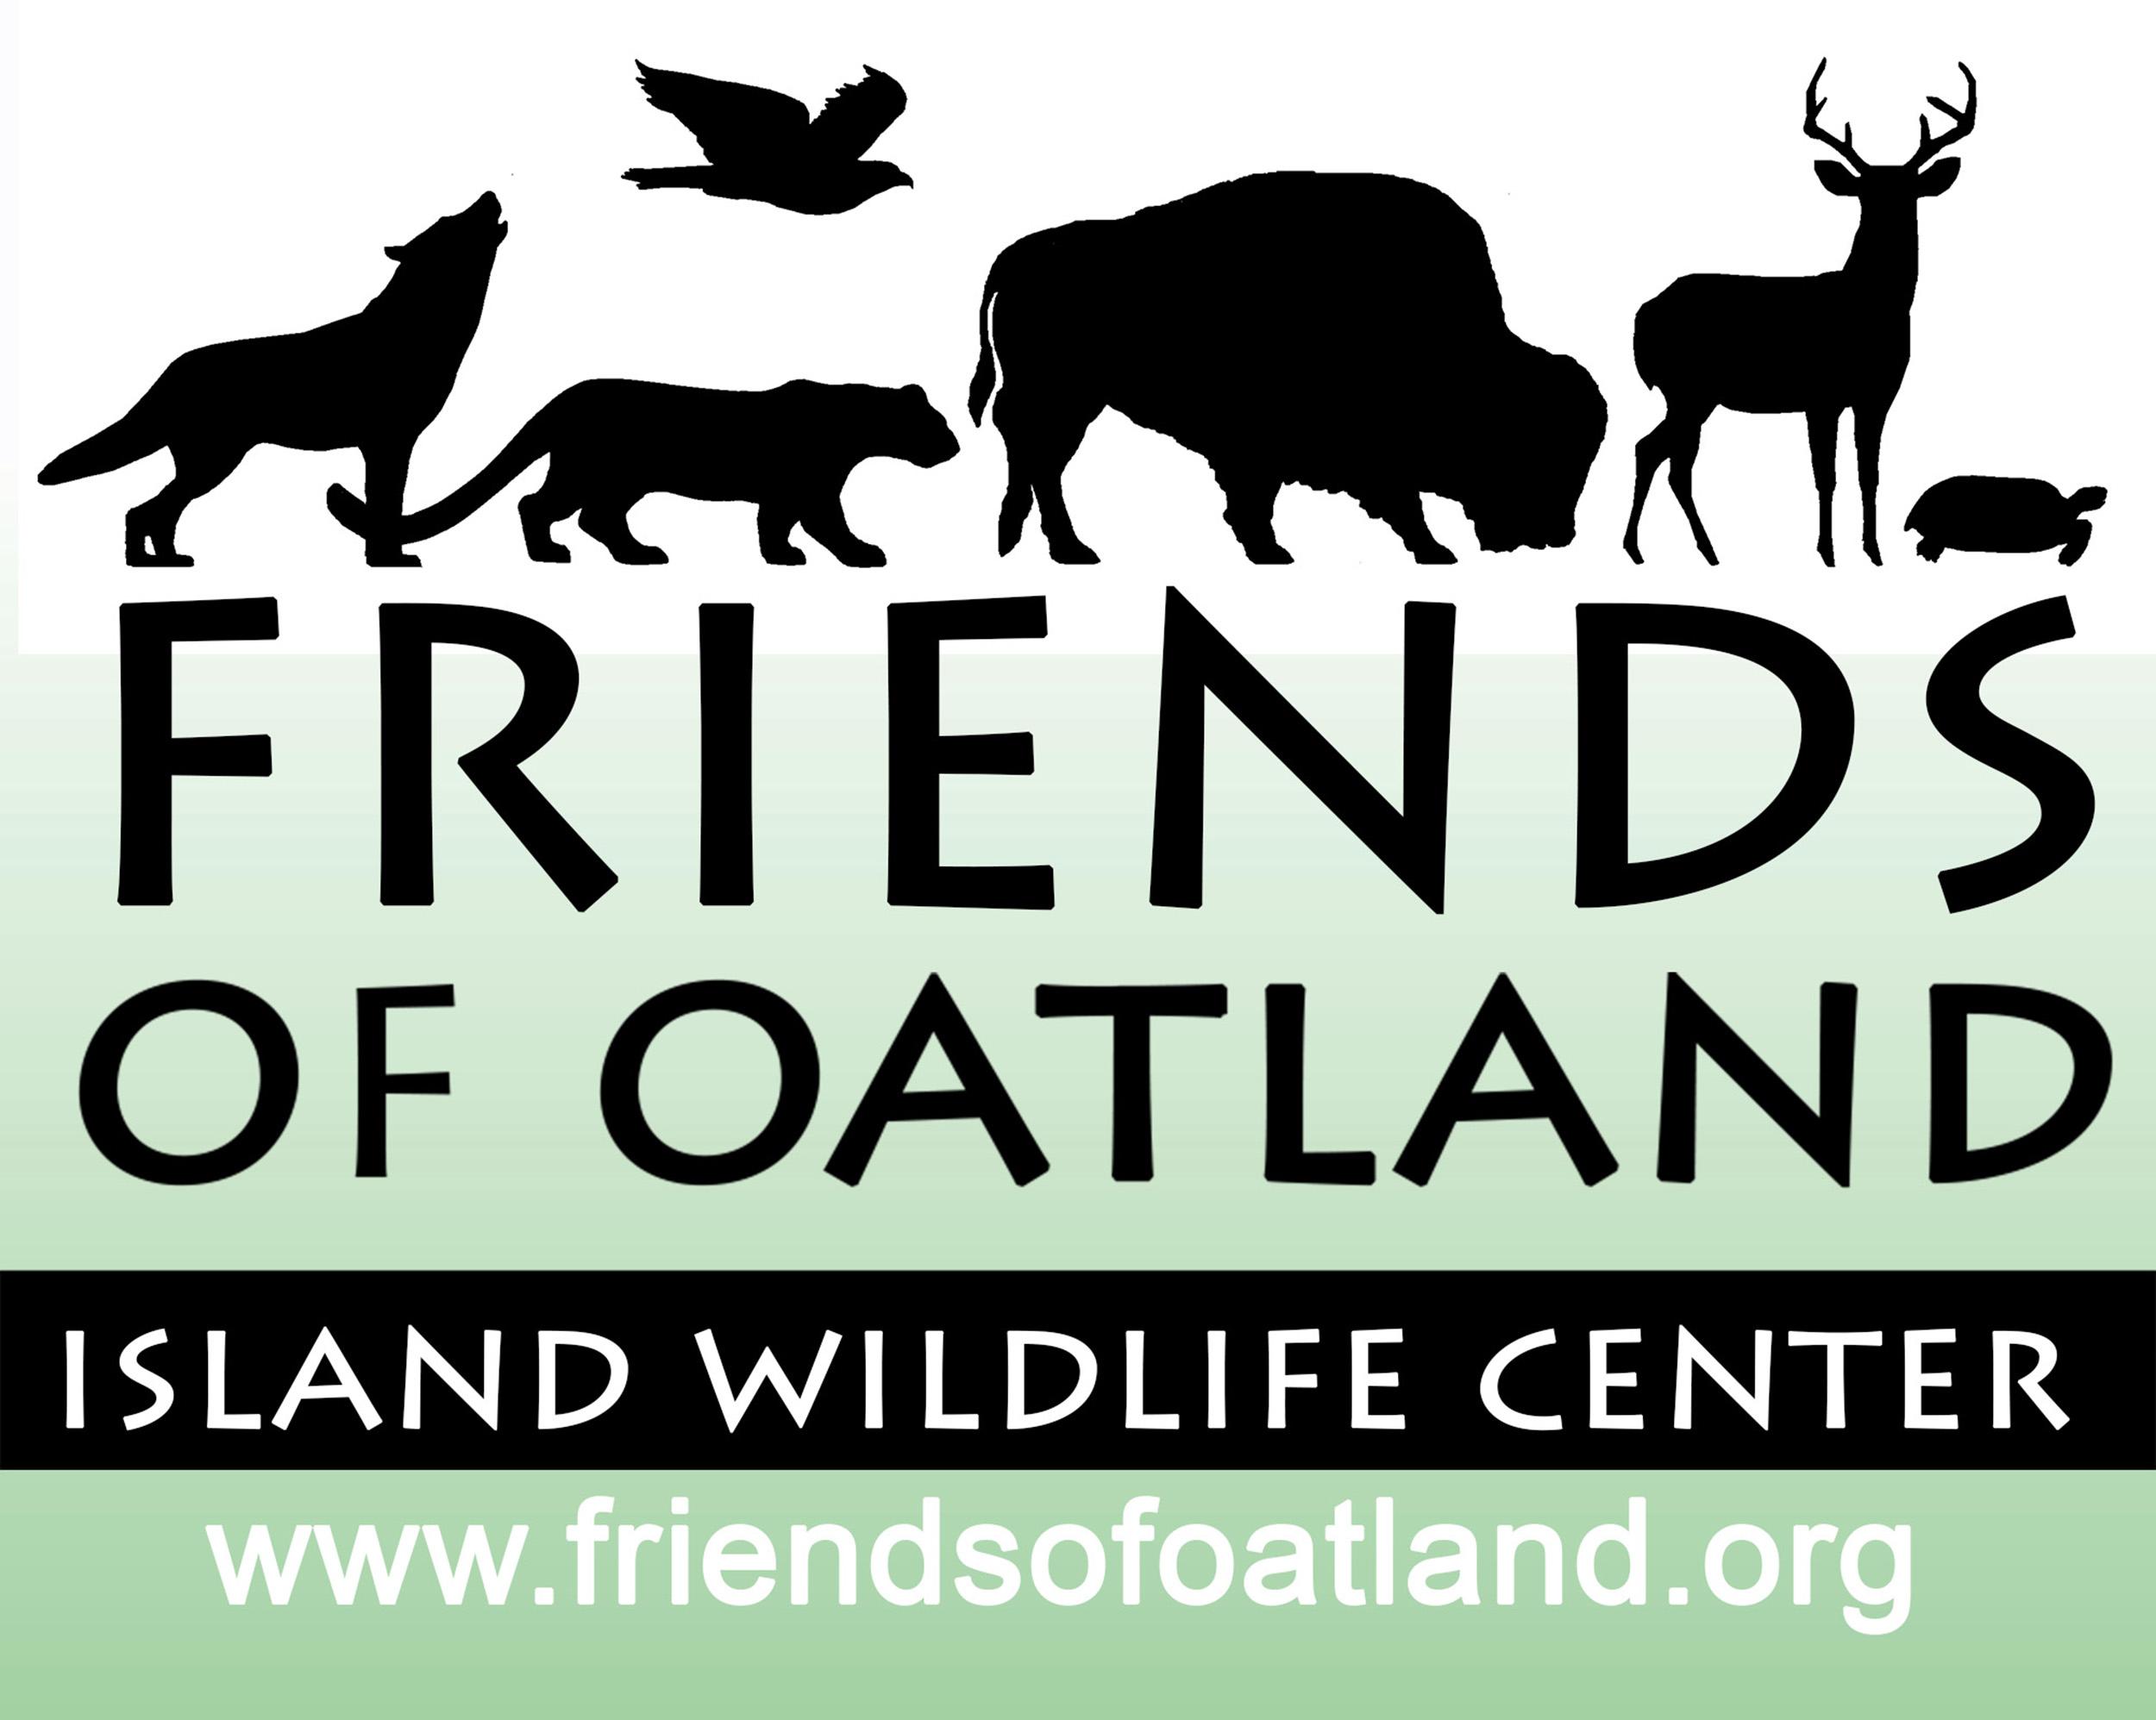 Support United Friends Of Oatland Island